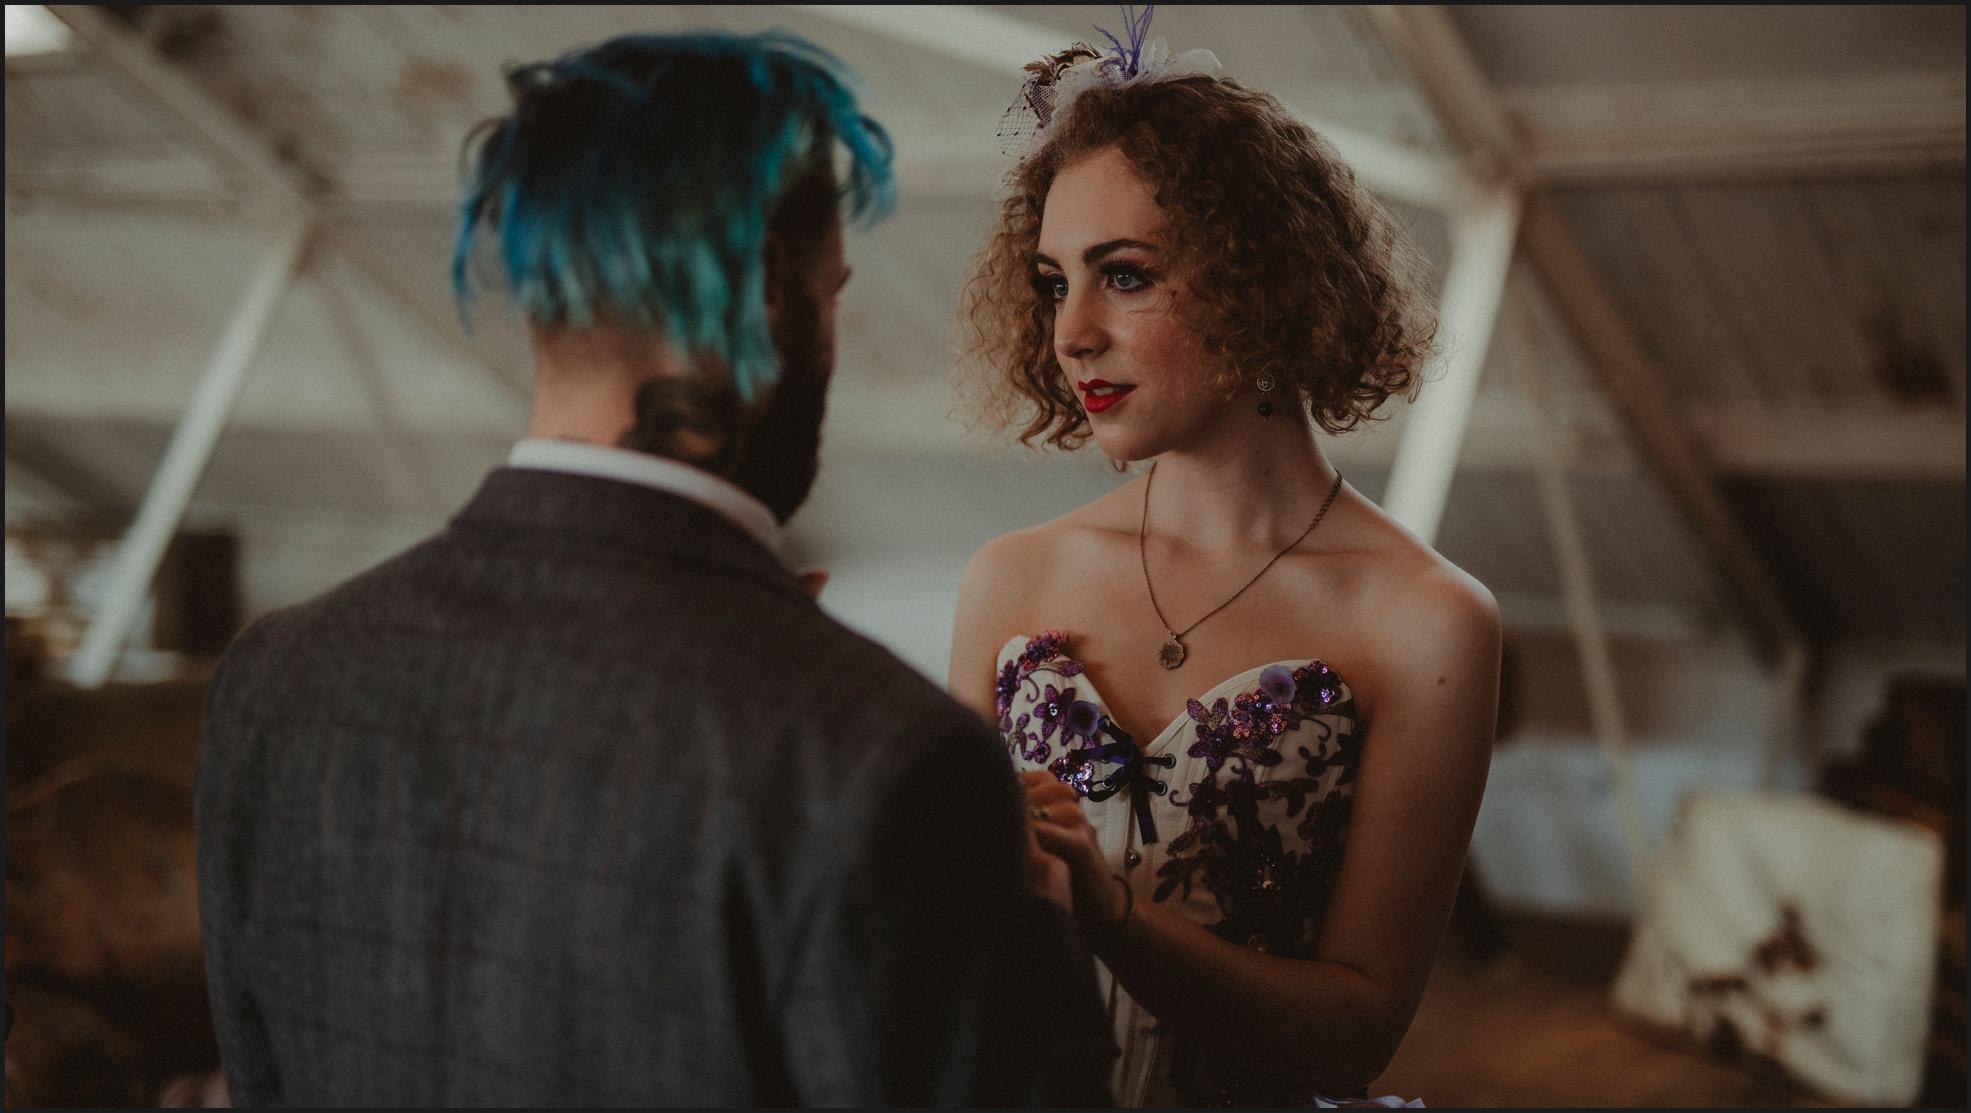 ceremony, wedding ceremony, bride, groom, celebrant, Dalston Heights, London, Steampunk, happy, smiles, couple, intimate